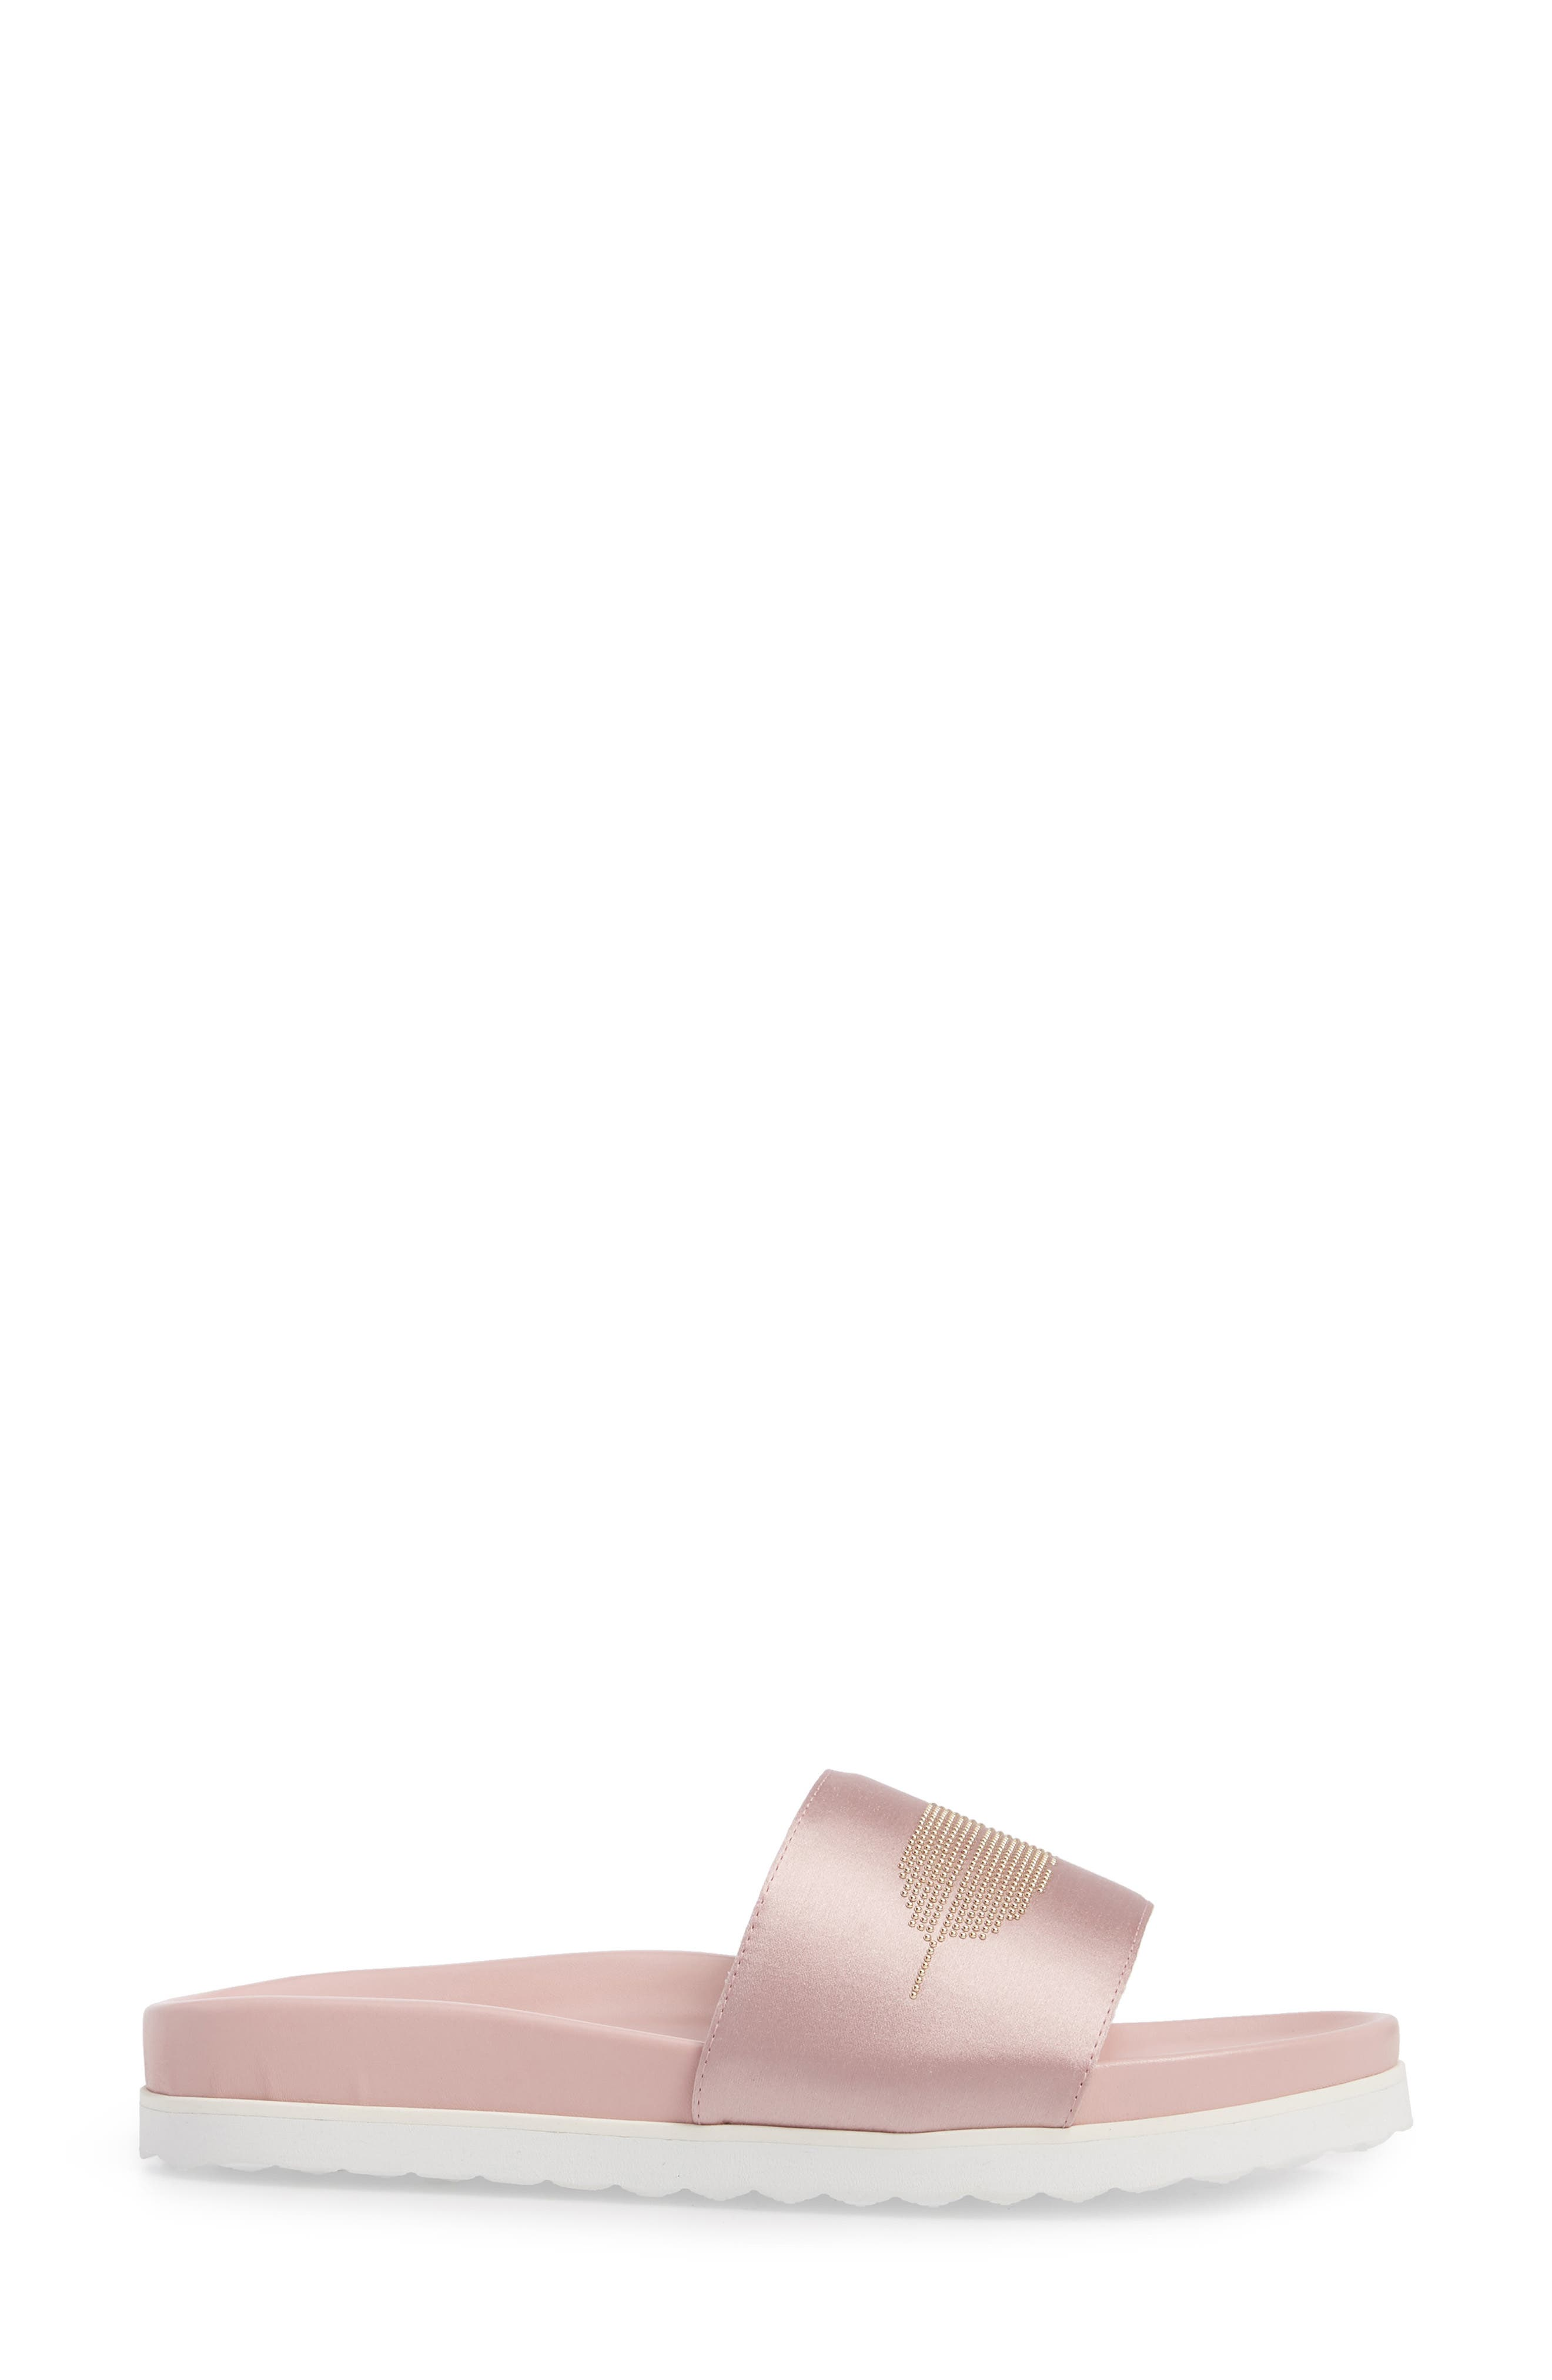 Satin Slide Sandal,                             Alternate thumbnail 3, color,                             Pink